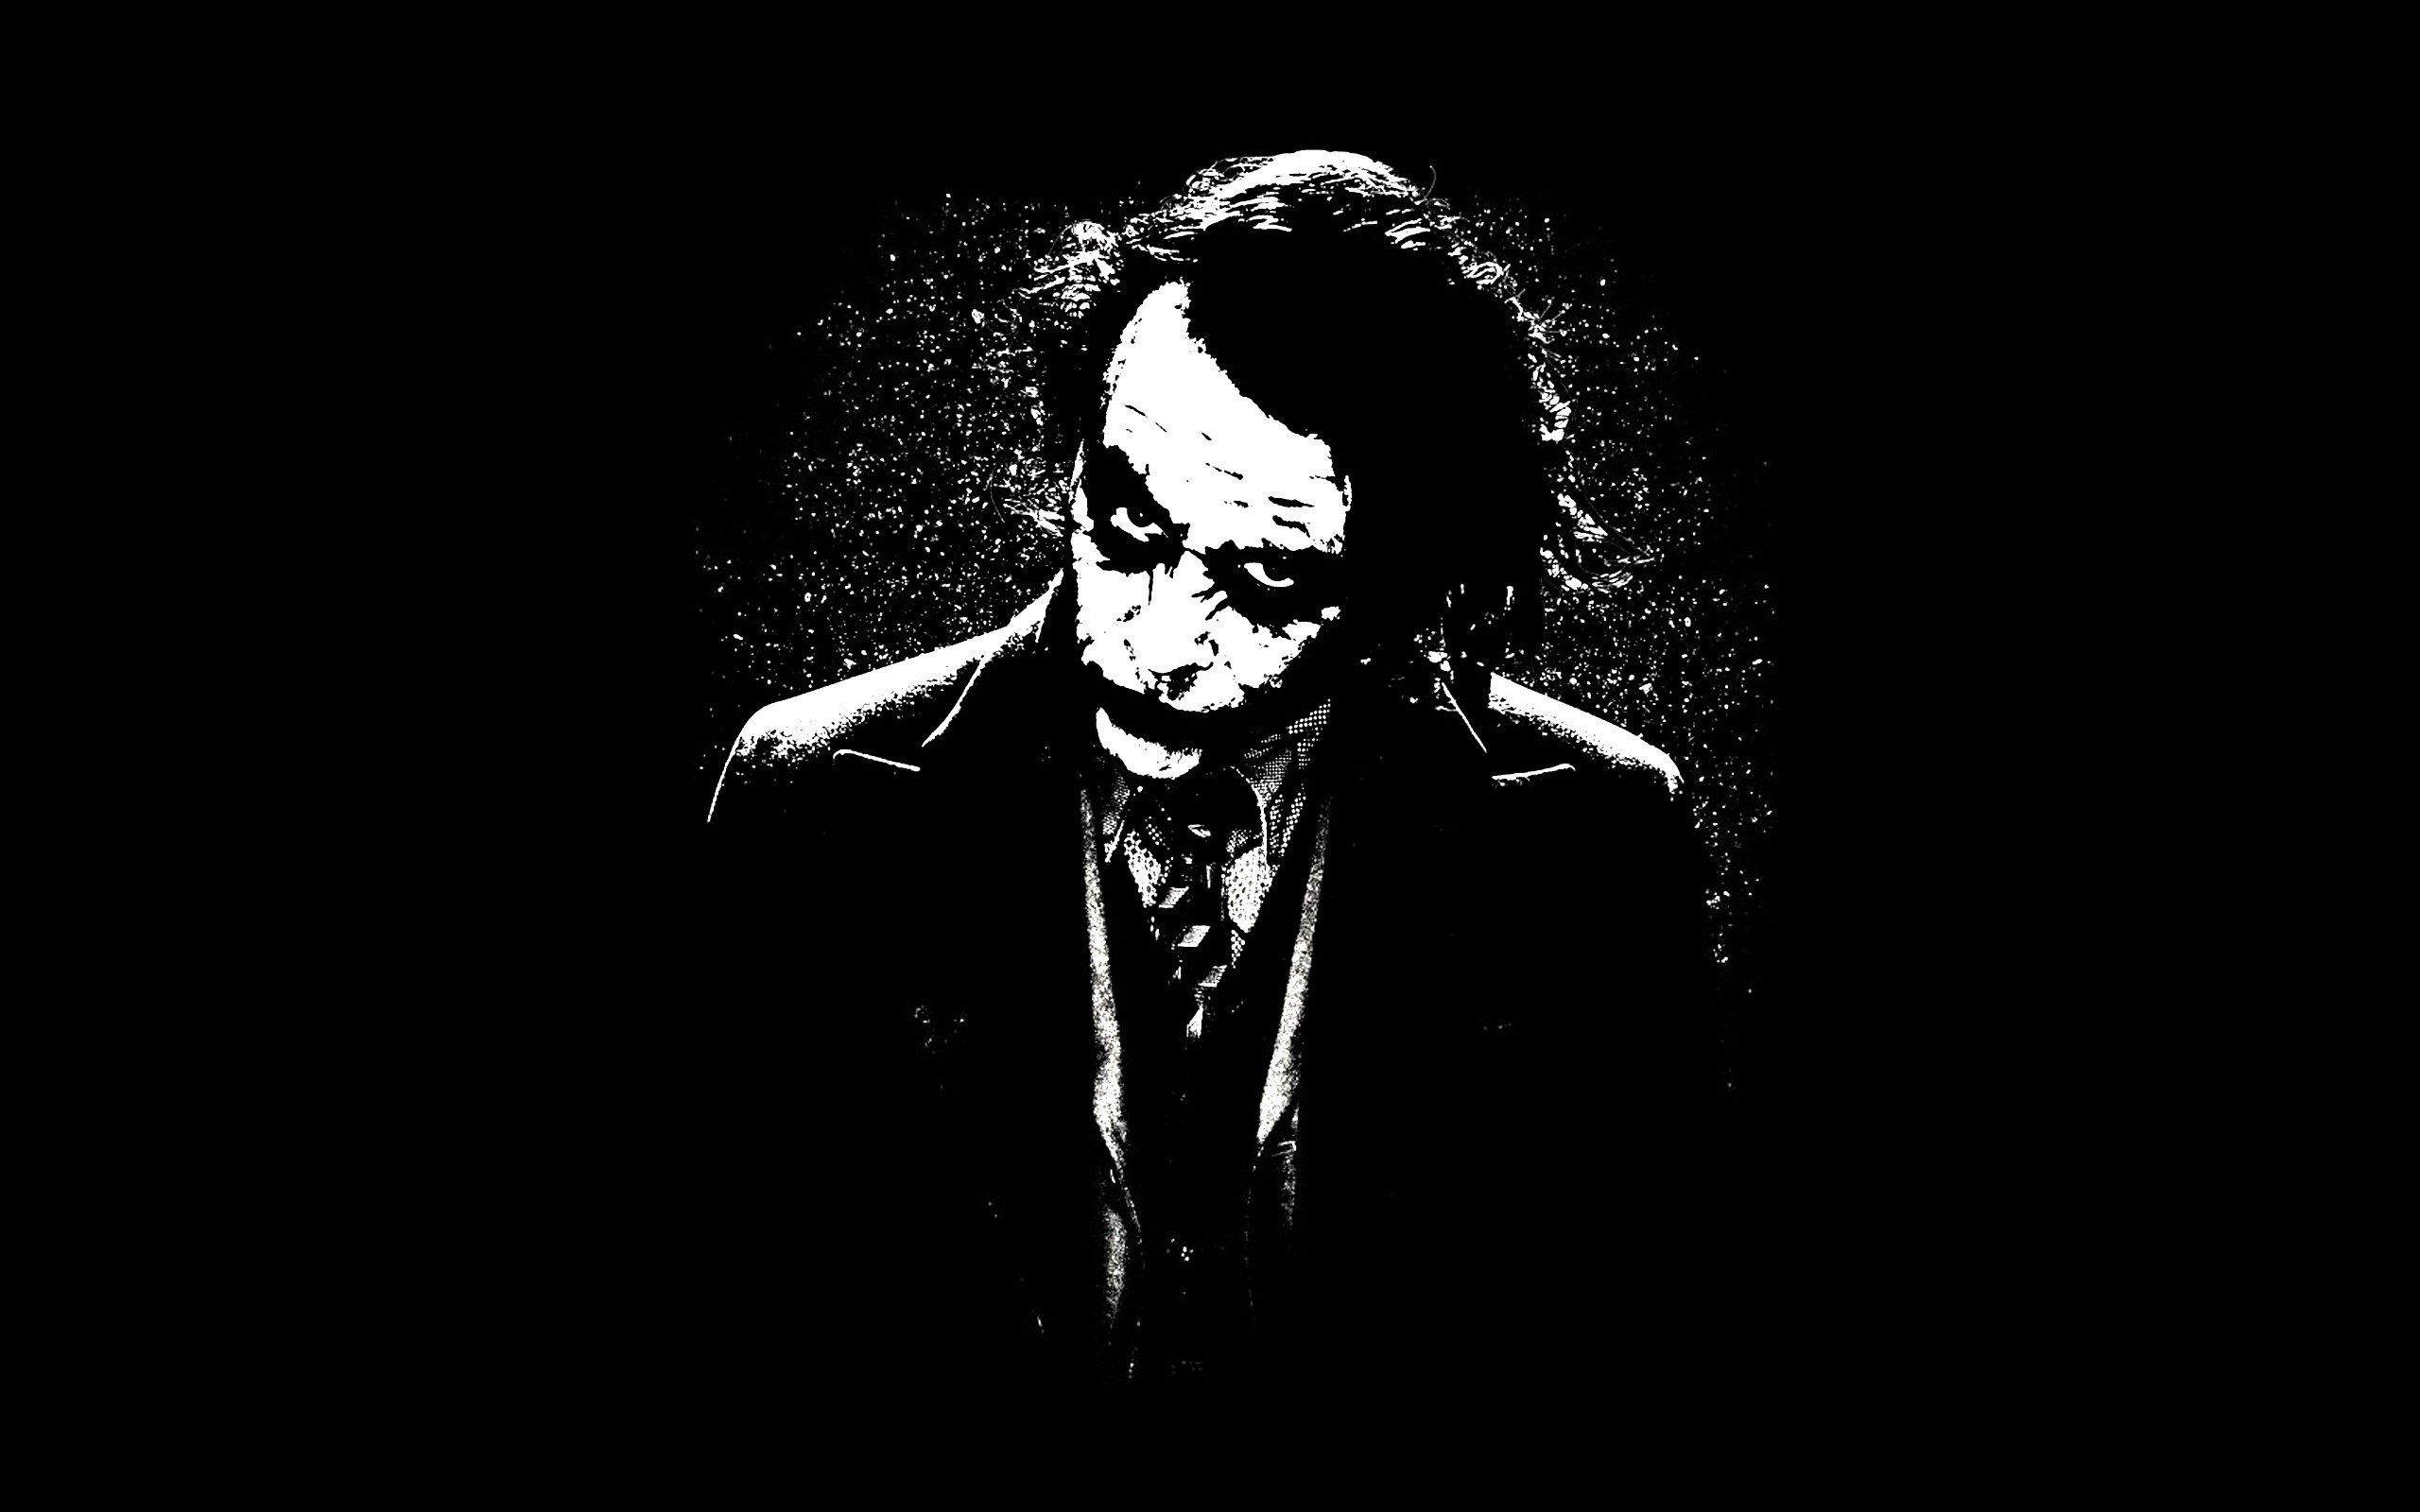 Wallpaper Images Joker Joker Category Joker Sketch Joker Hd